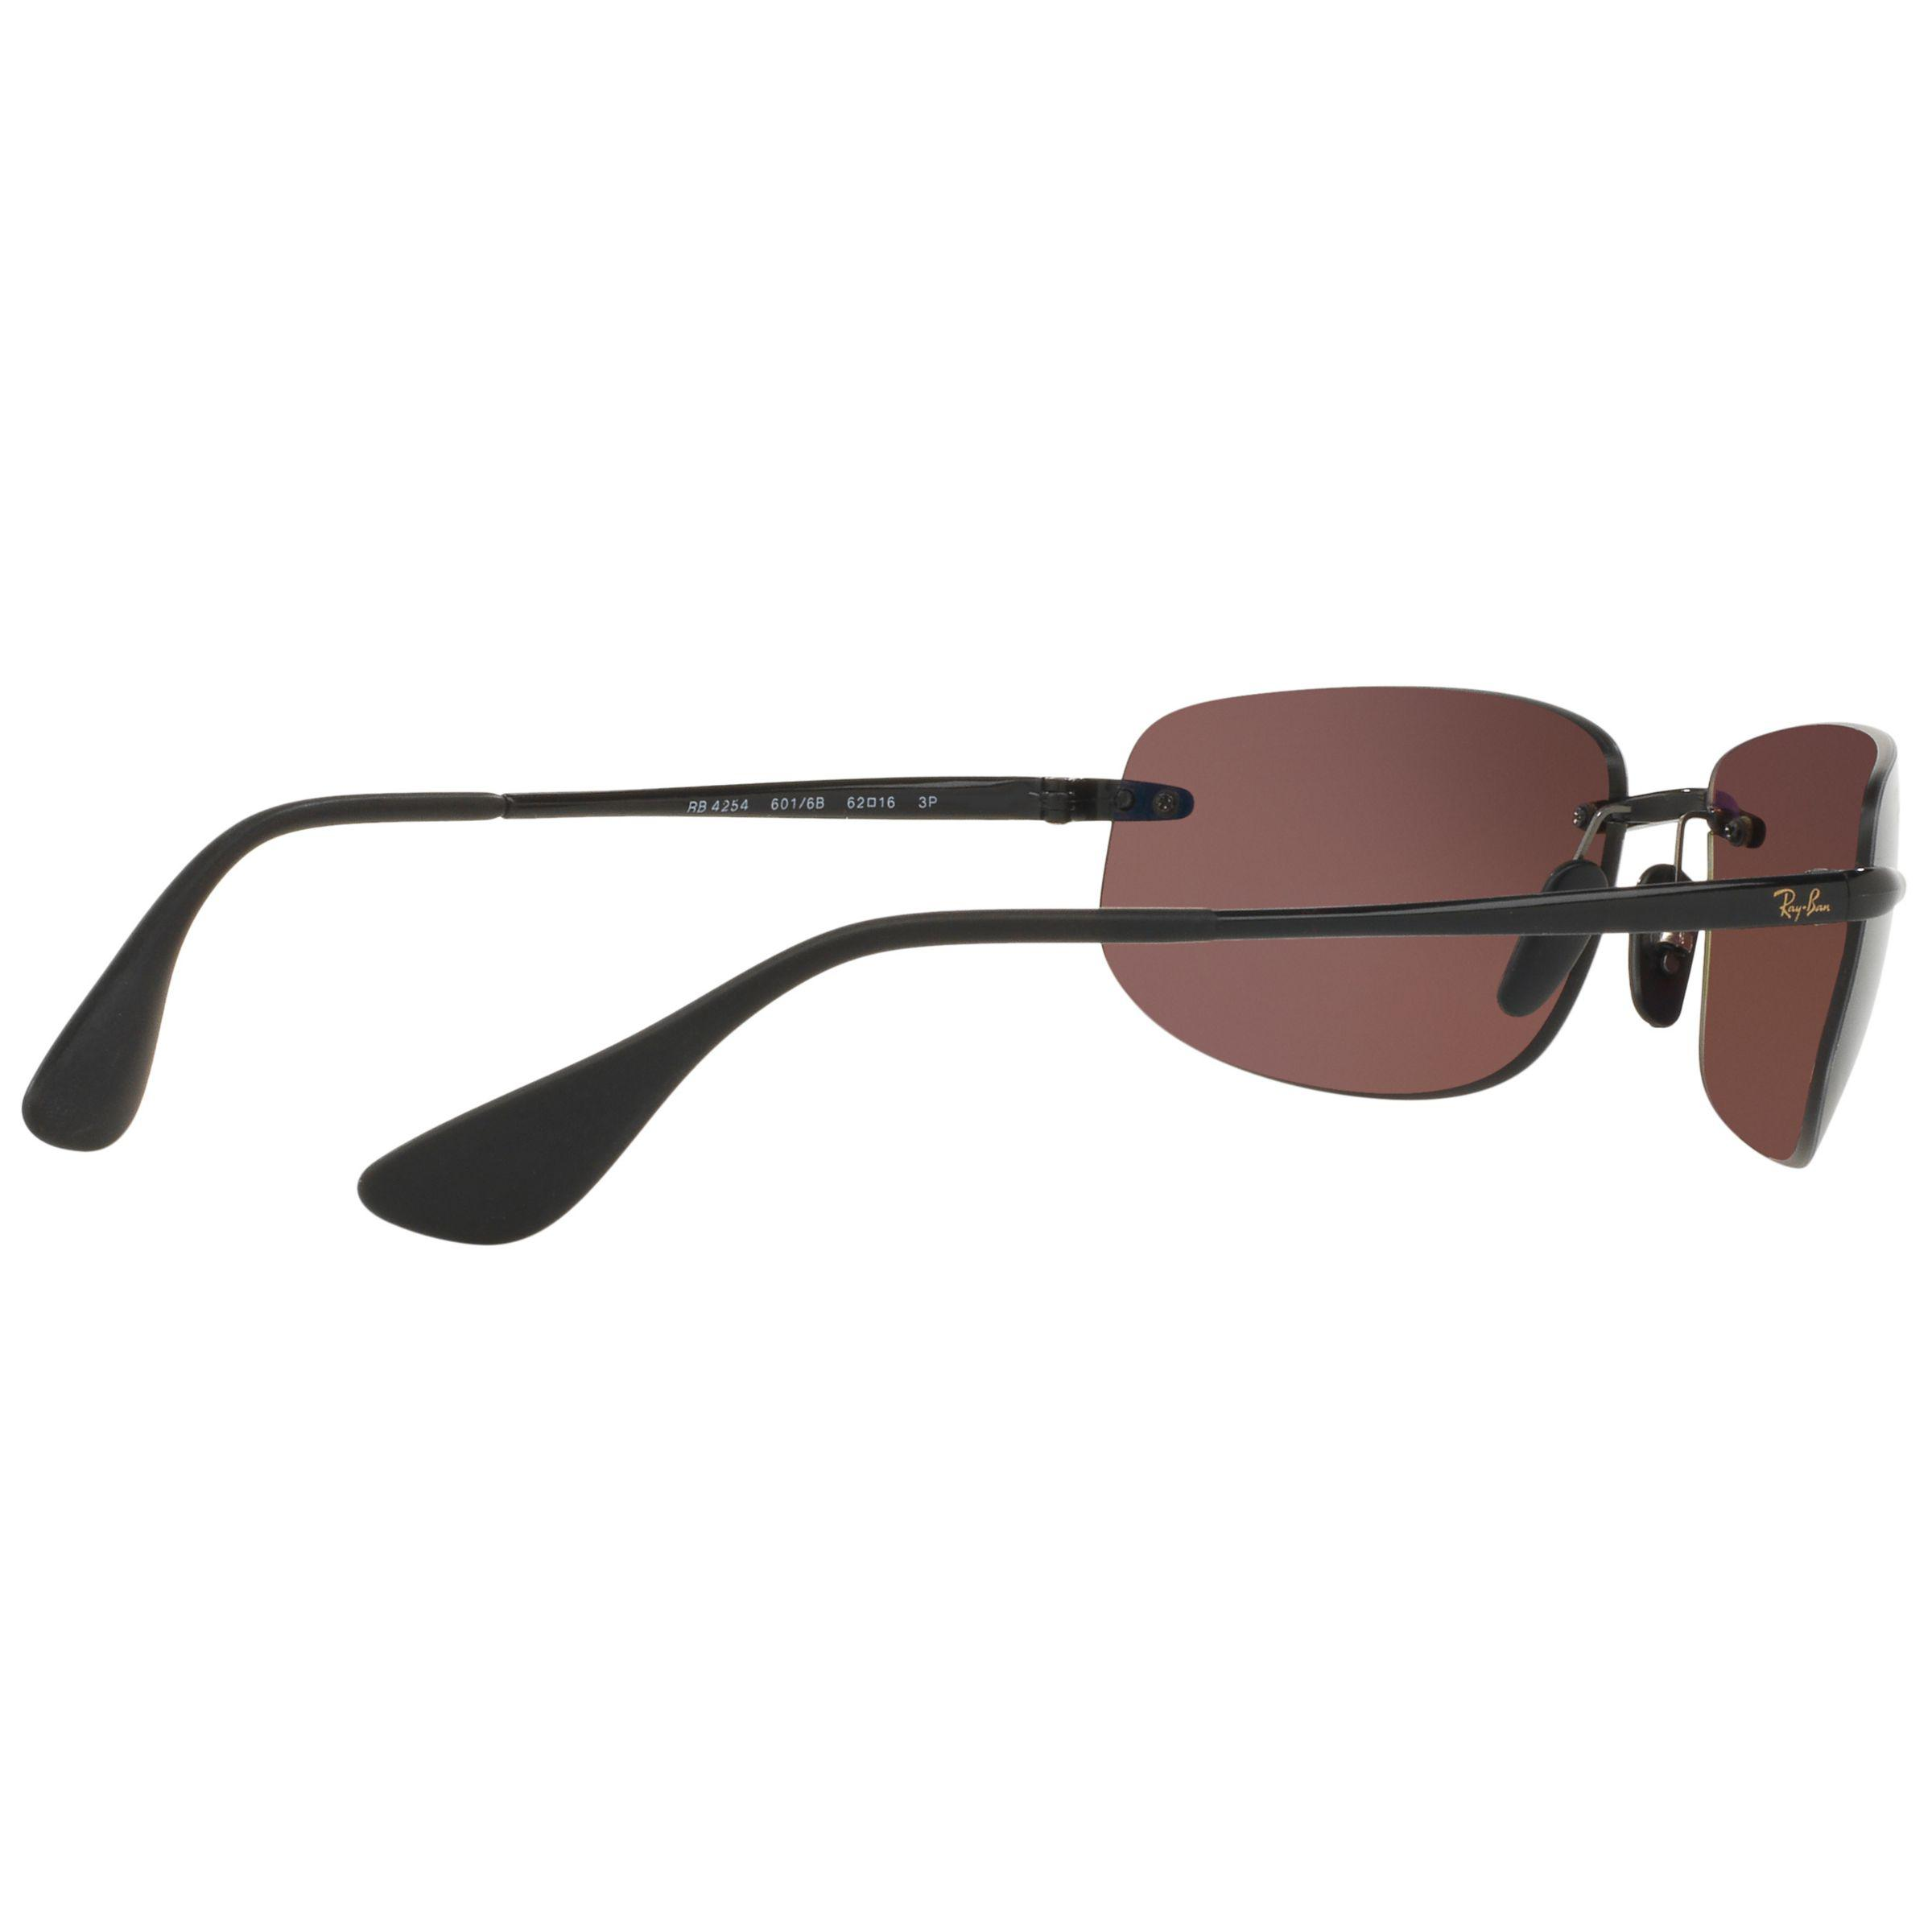 81b4f9bb59 Ray-Ban Rb4254 Chromance Polarised Rectangular Sunglasses in Purple ...